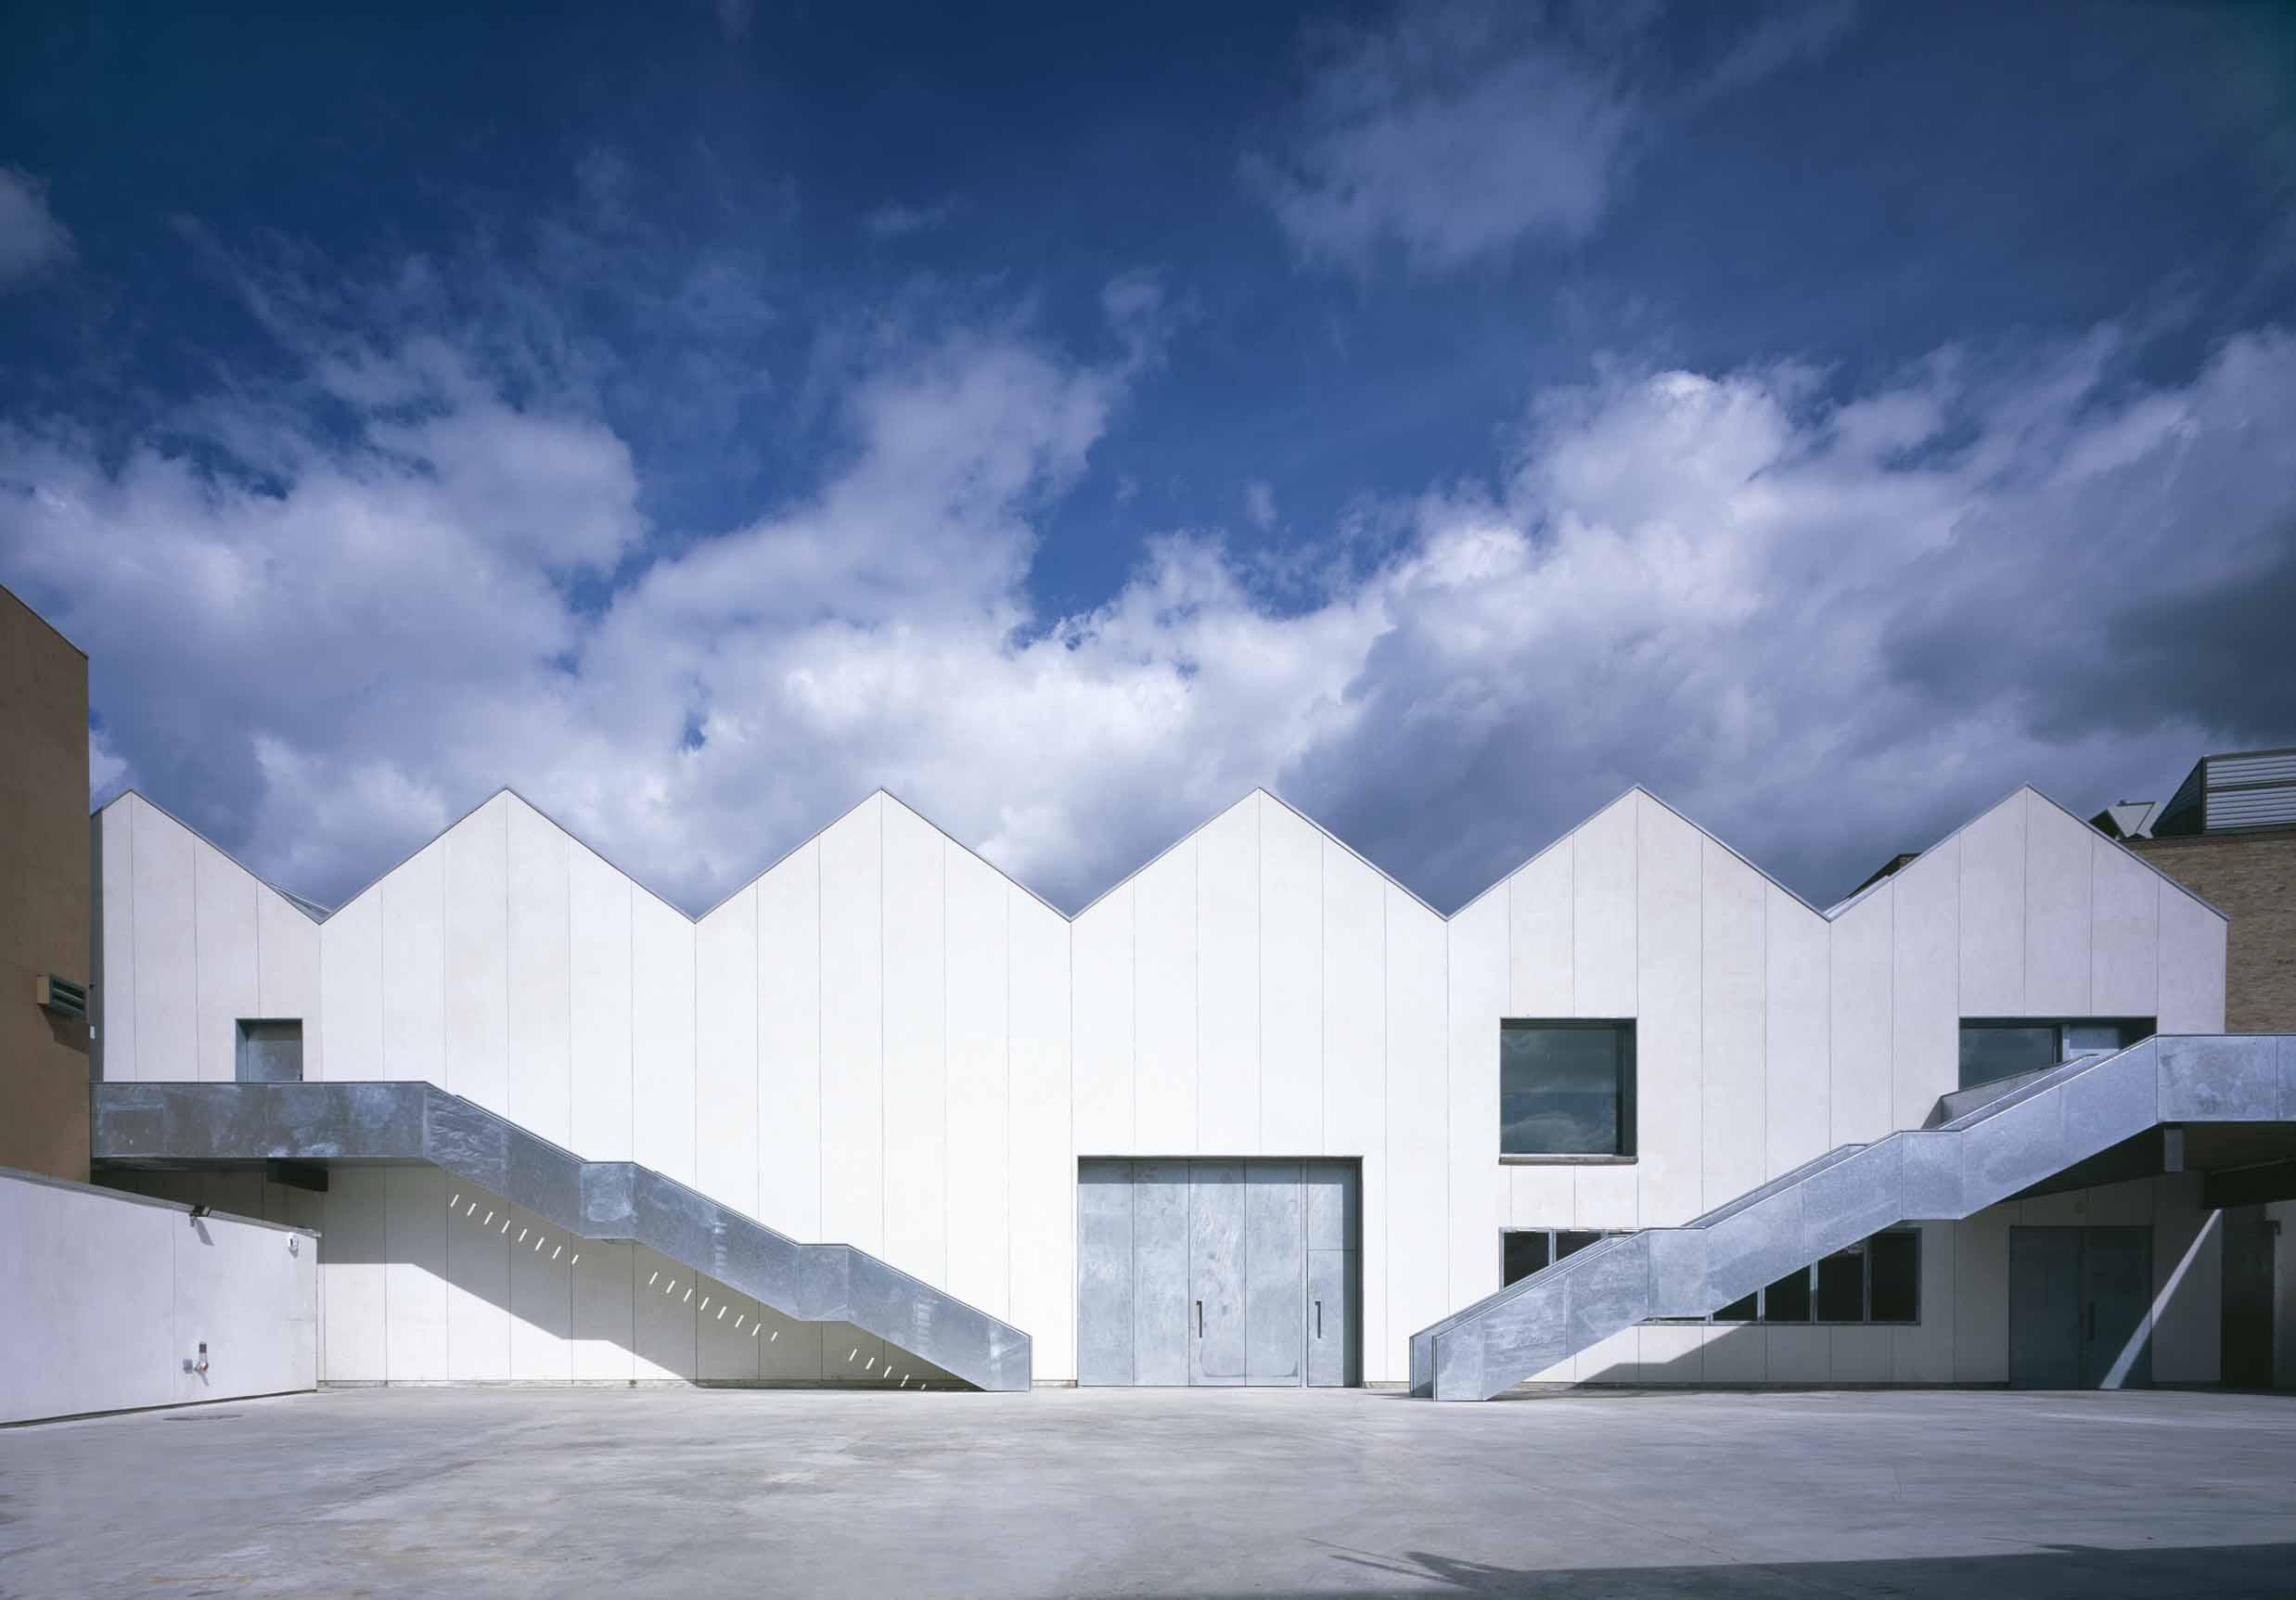 David Chipperfield Architects, Gormley Studio